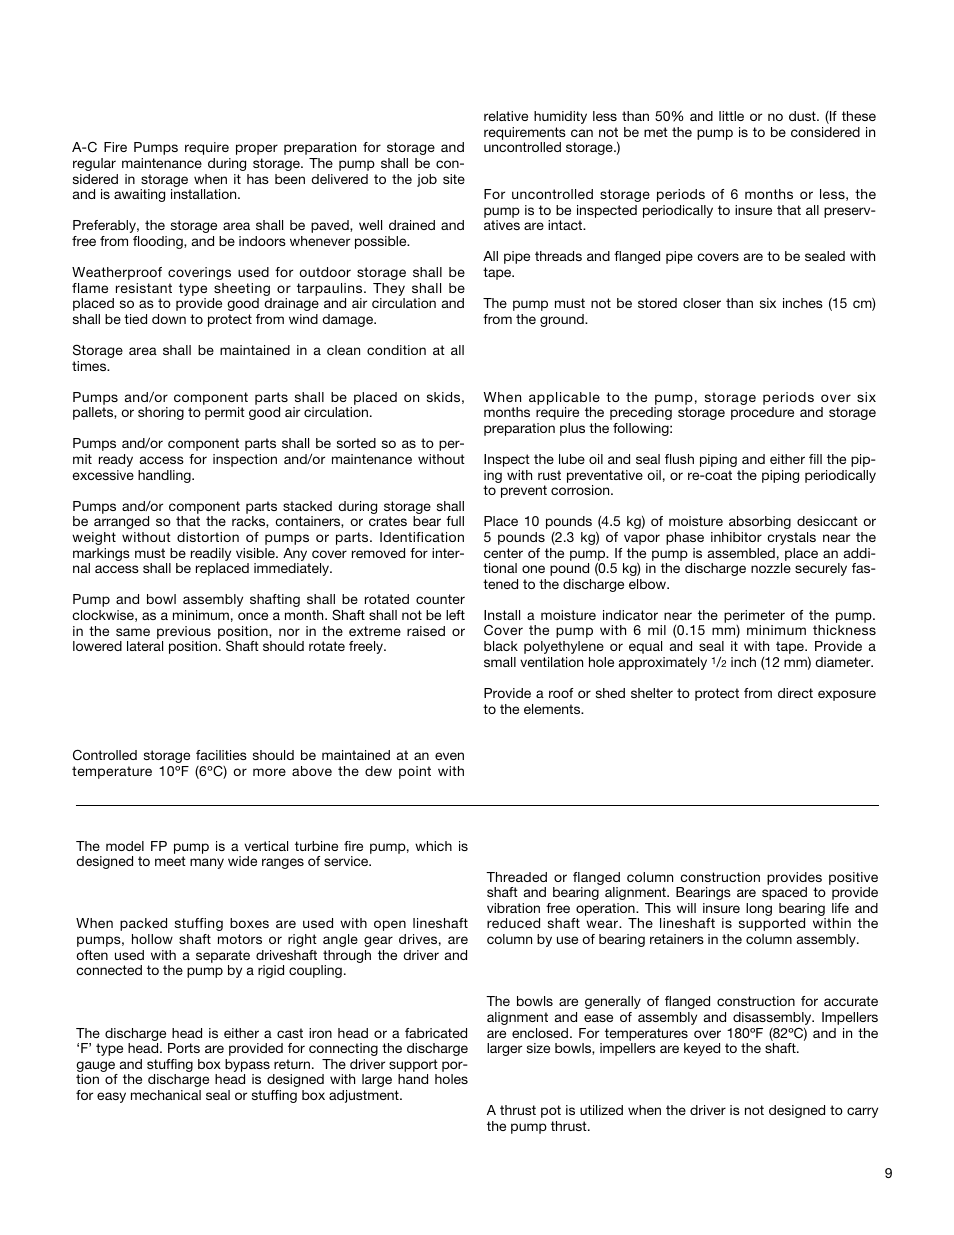 General description | Xylem A-C Fire Pump – Vertical Turbine